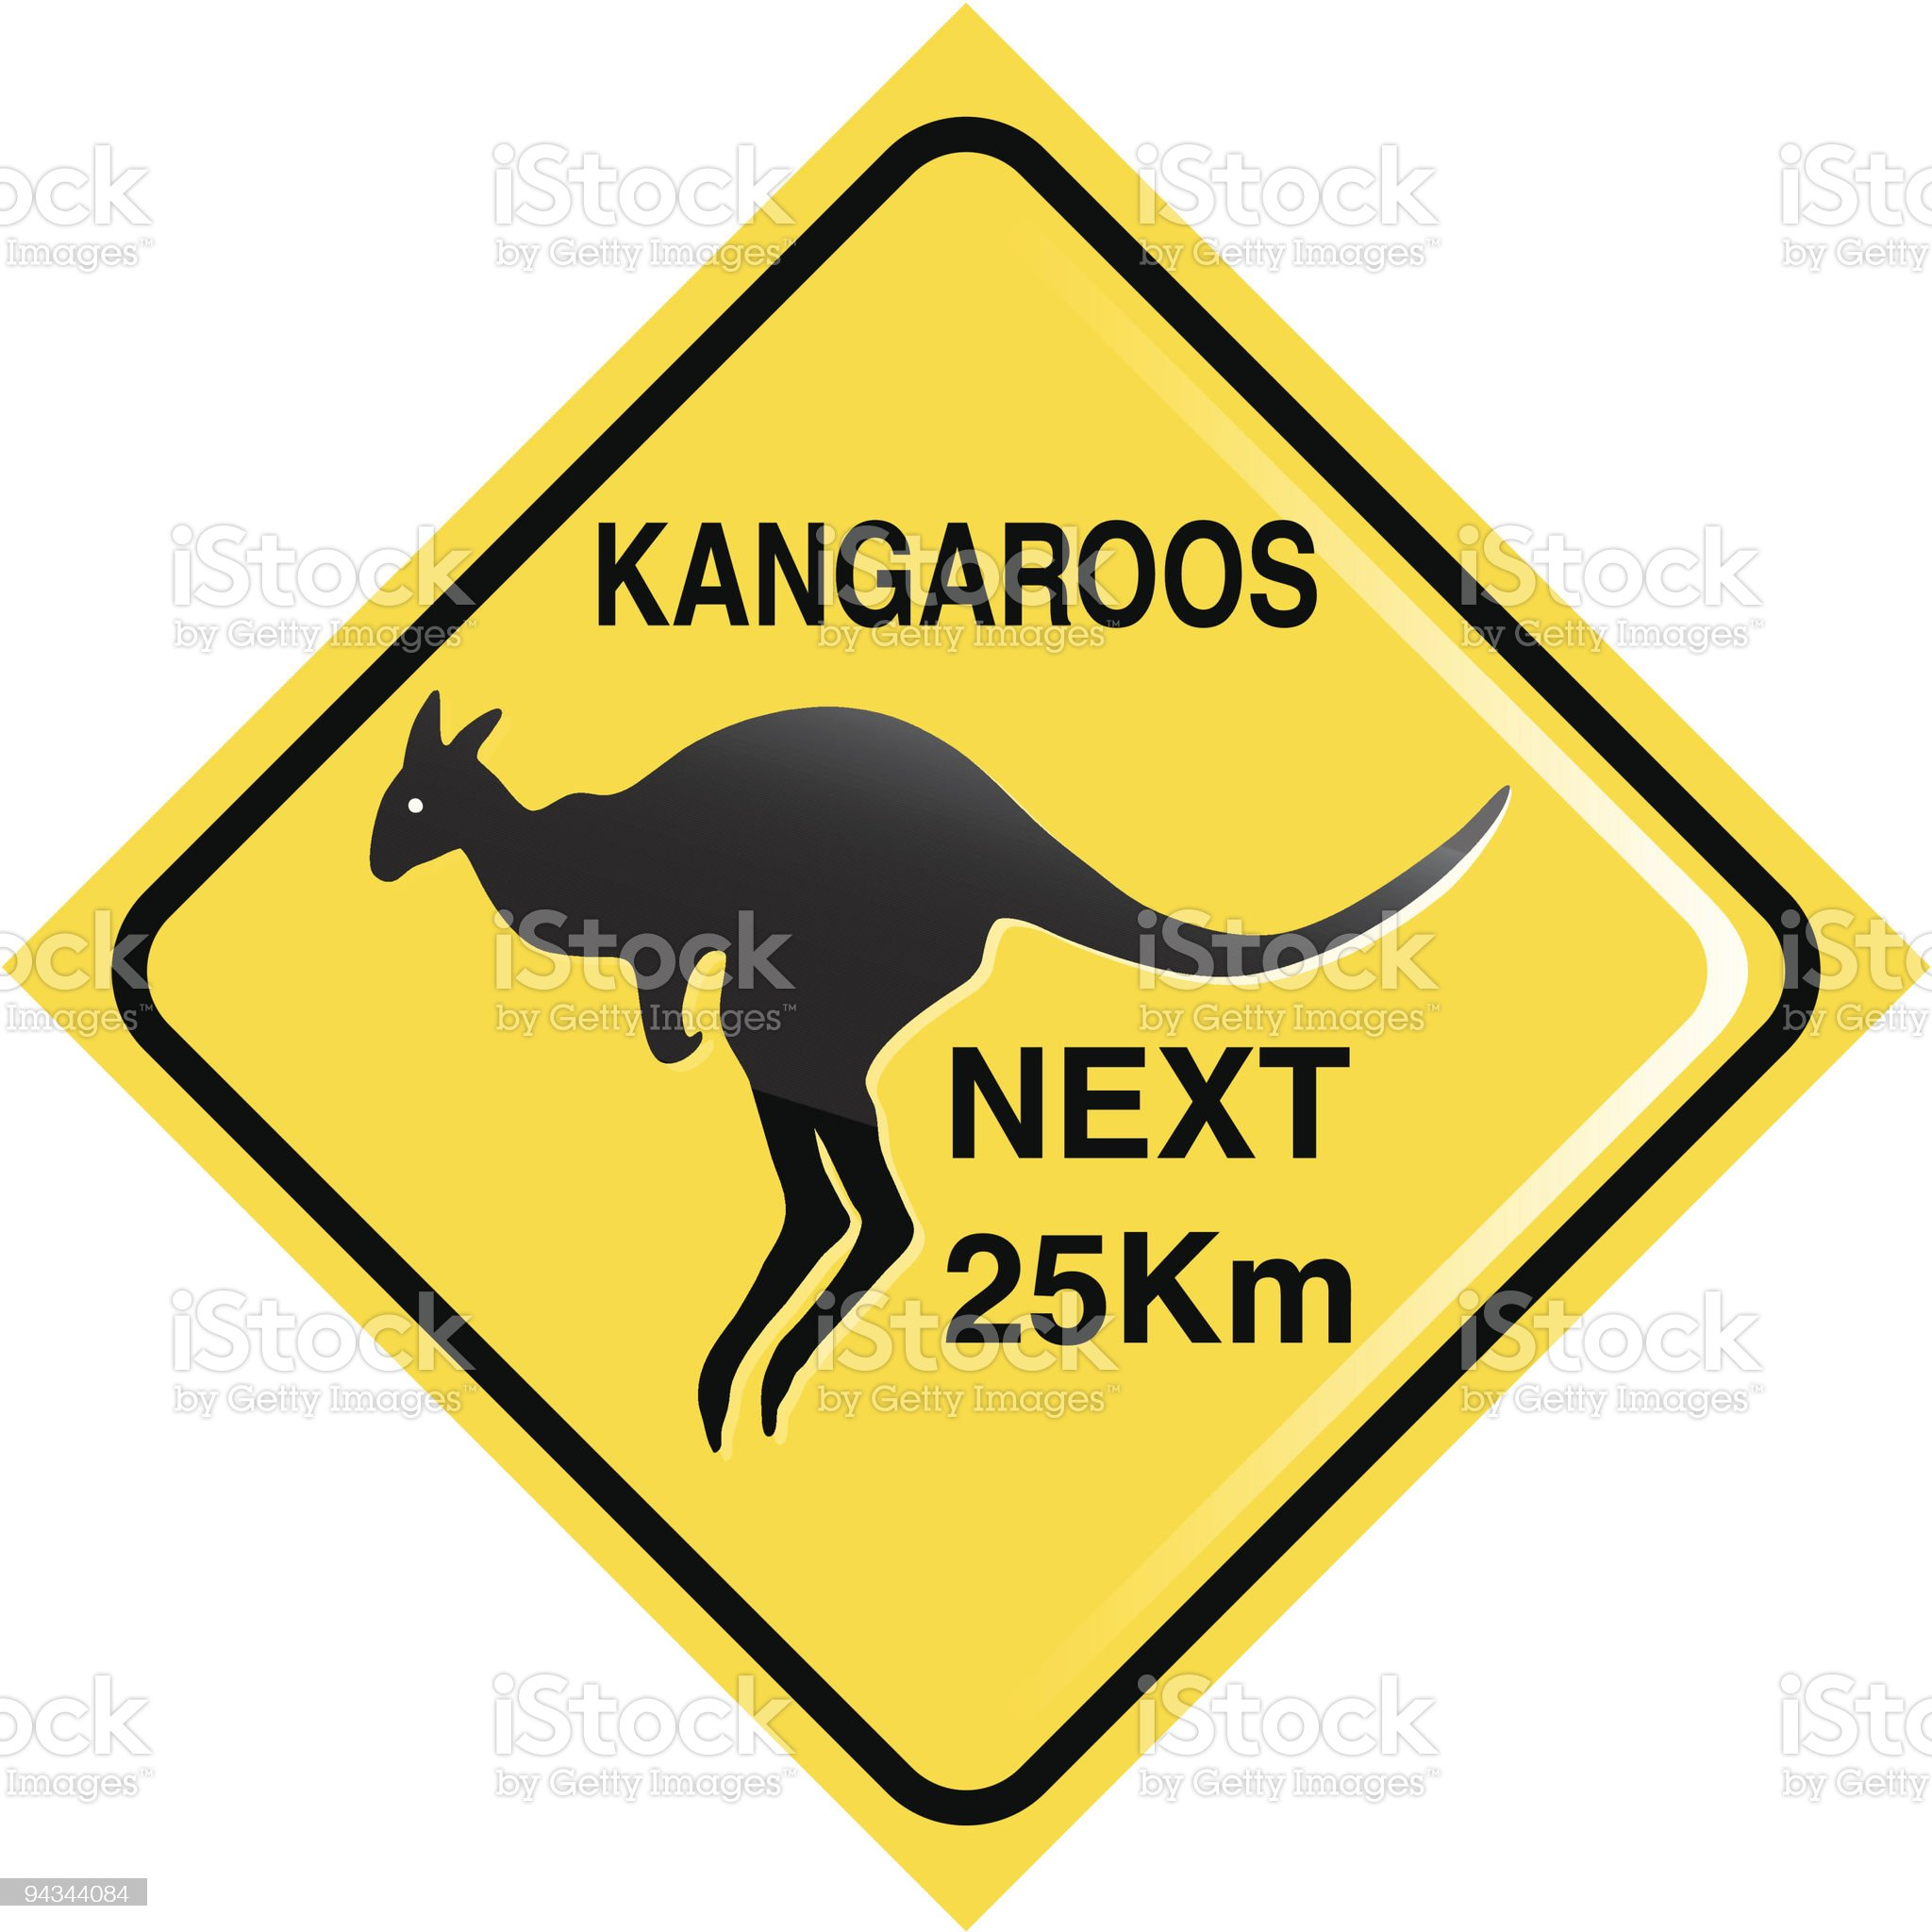 Kangaroo traffic sign royalty-free stock vector art